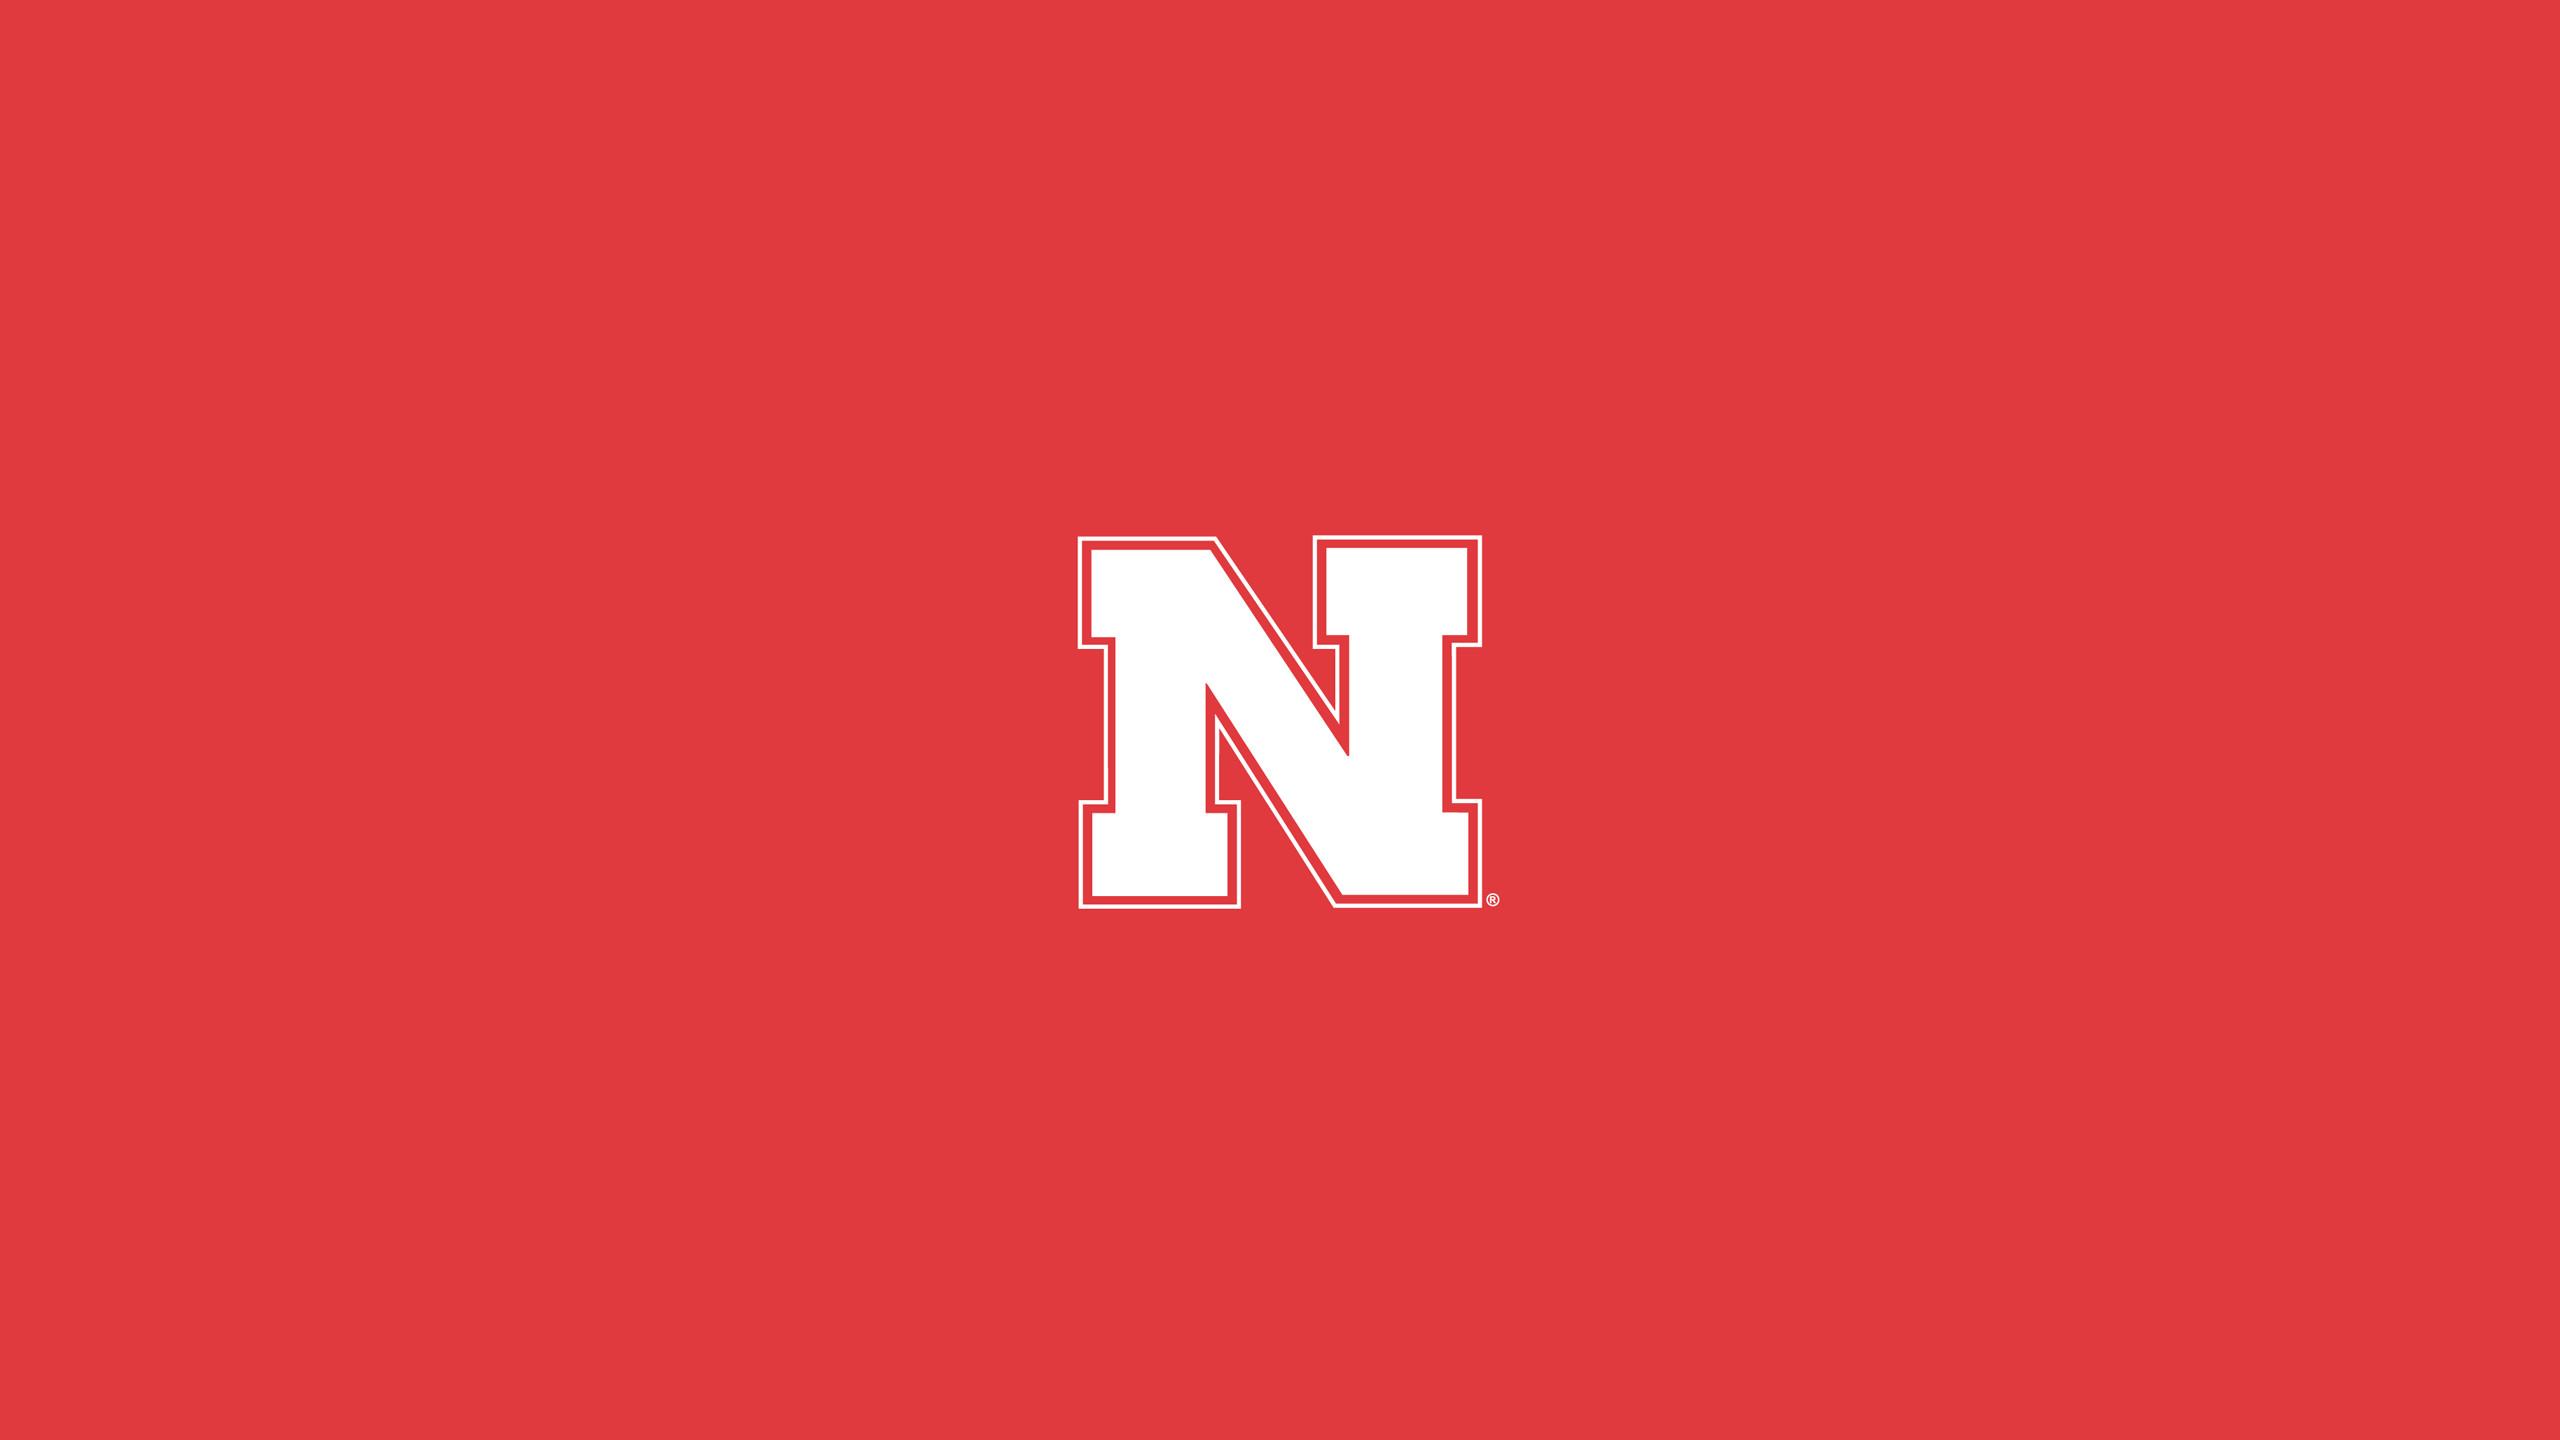 Nebraska Wallpaper 58 images 2560x1440